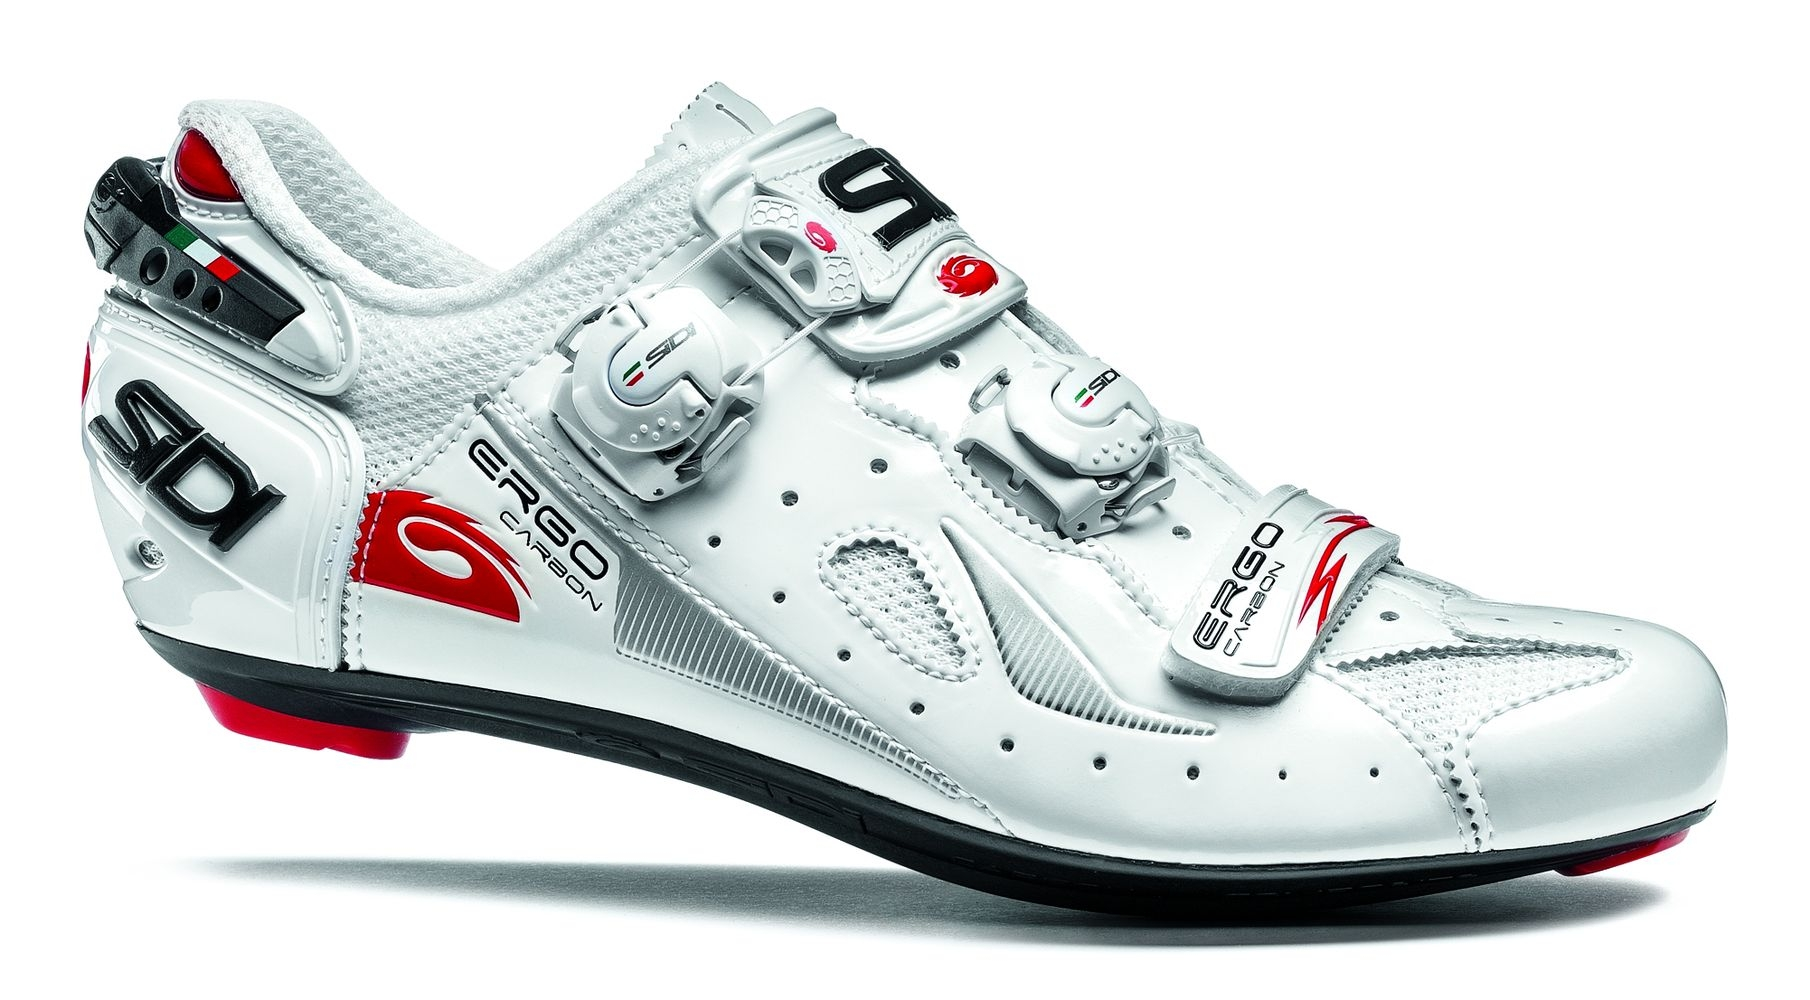 Chaussures Sidi ERGO 4 Carbon Composite Blanc - 41